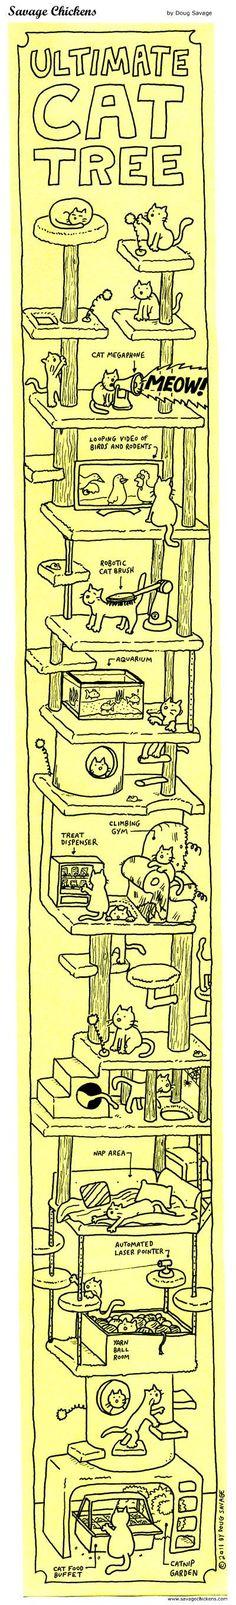 Ultimate Cat Tree Cartoon   Savage Chickens – Cartoons on Sticky Notes by Doug Savage